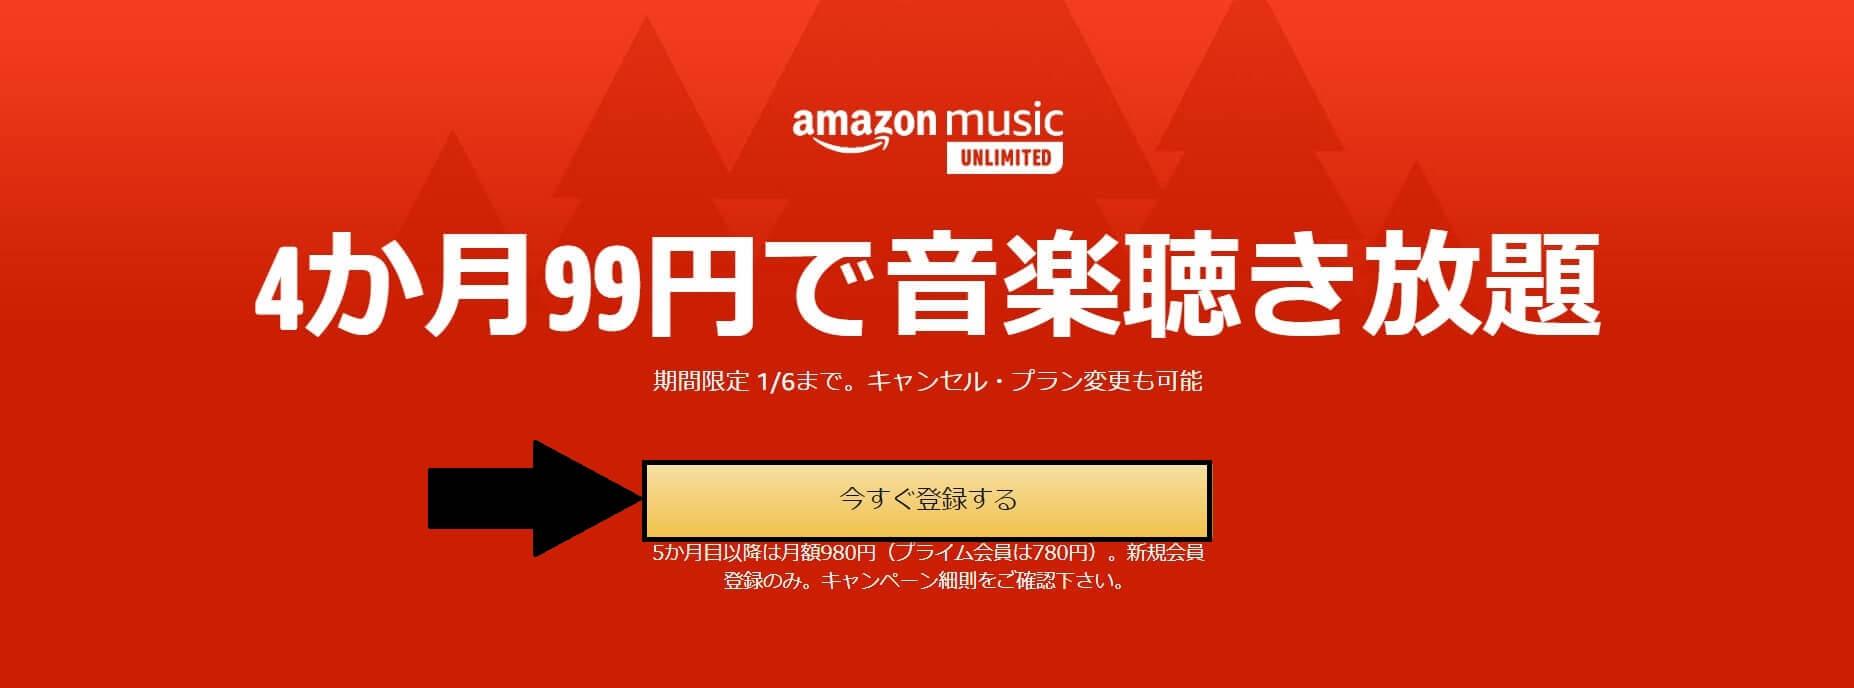 amazon music unlimited キャンペーン登録方法